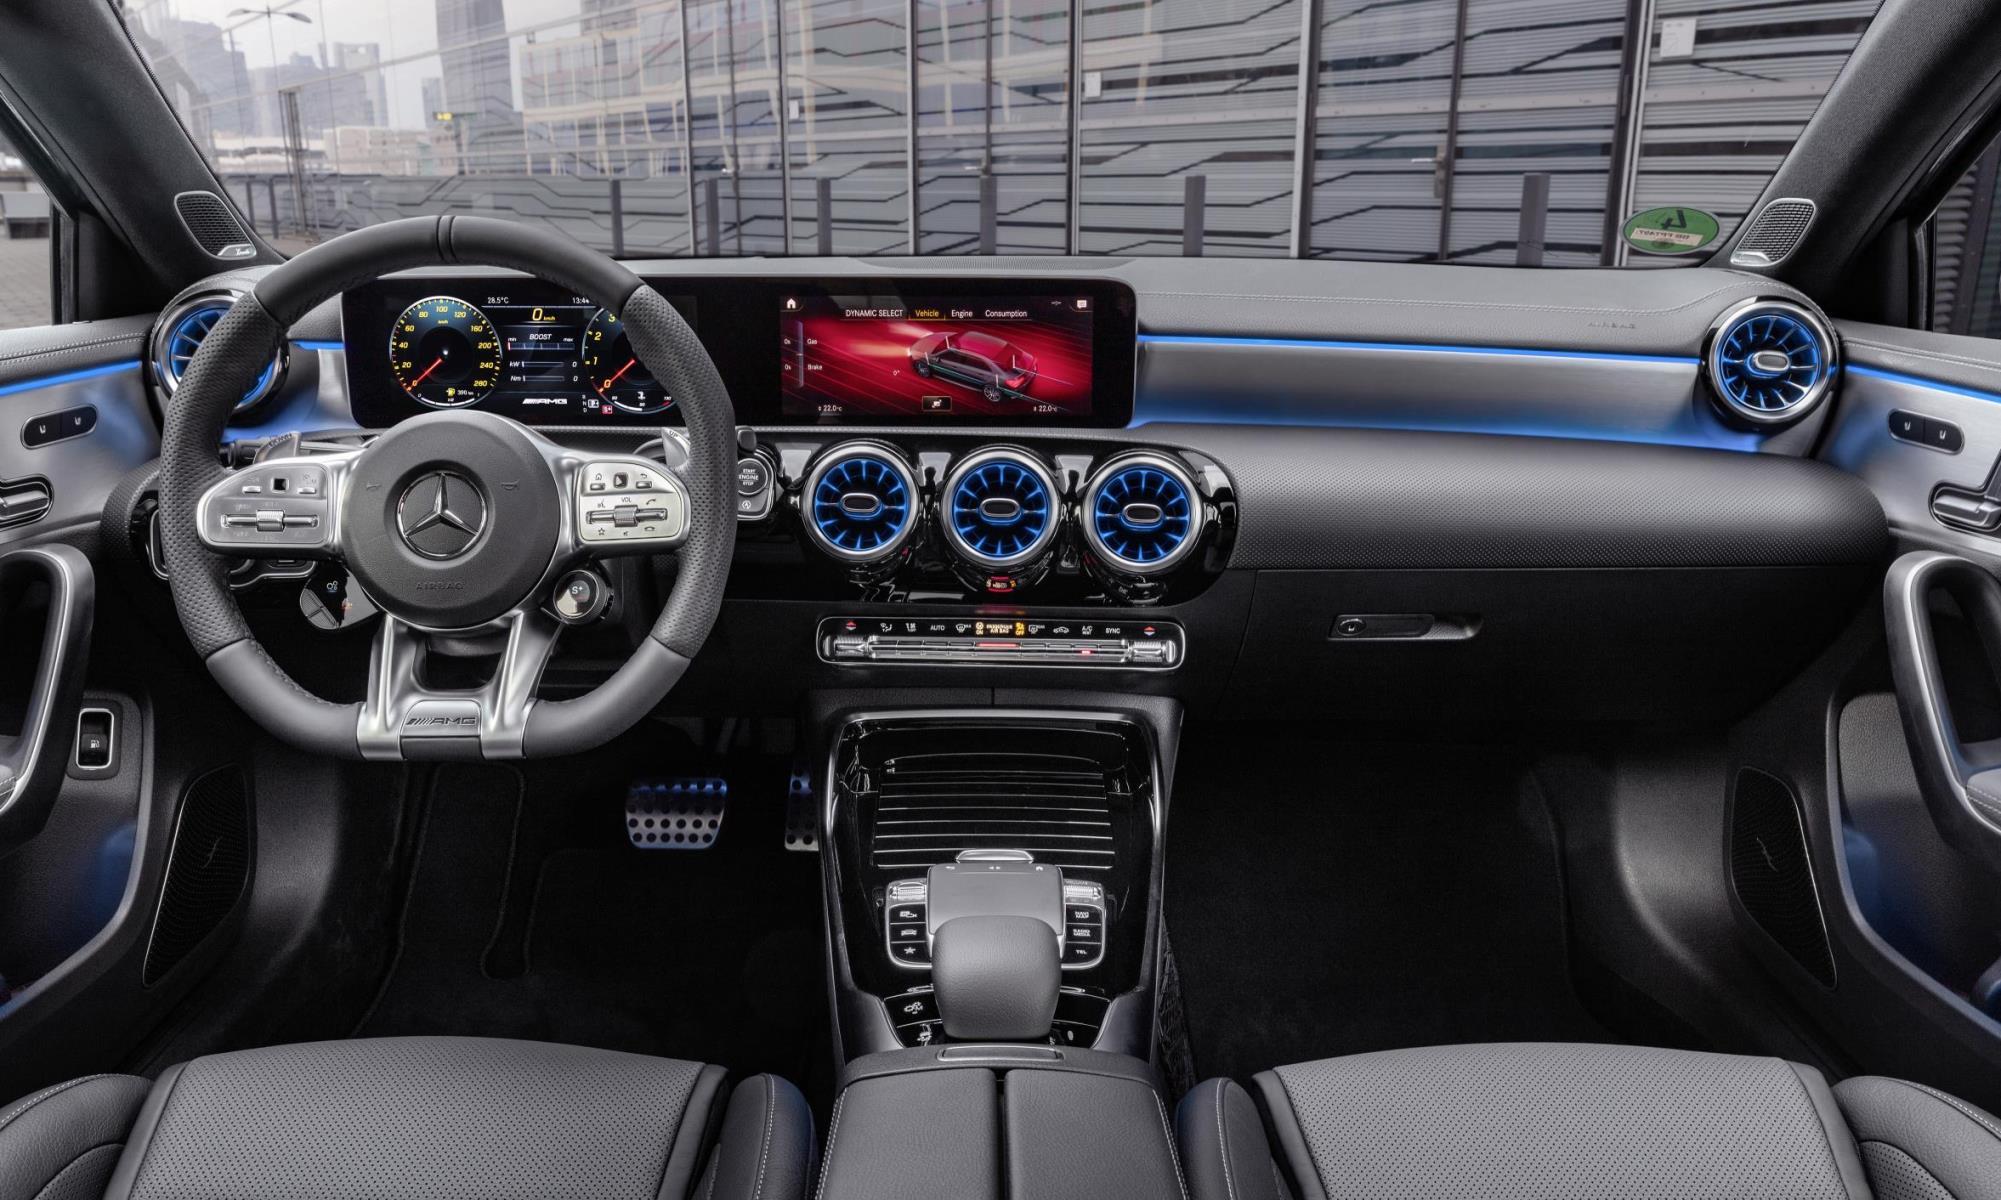 Mercedes-AMG A35 4Matic Saloon interior